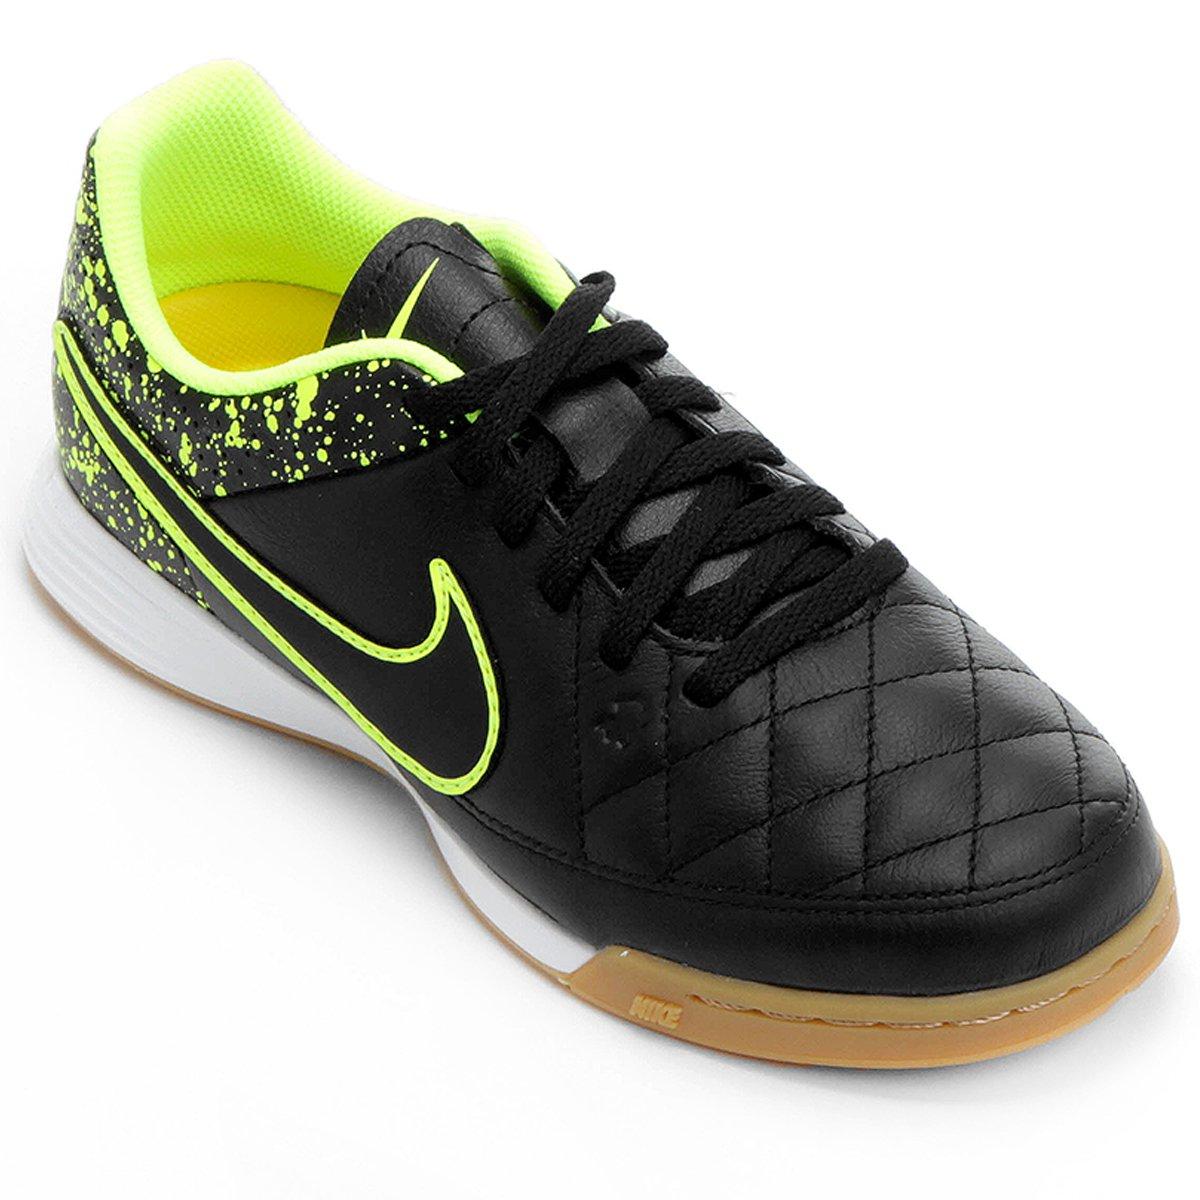 df40f132bafb4 Chuteira Nike Tiempo Gênio Leather IC Futsal Infantil - Compre Agora ...